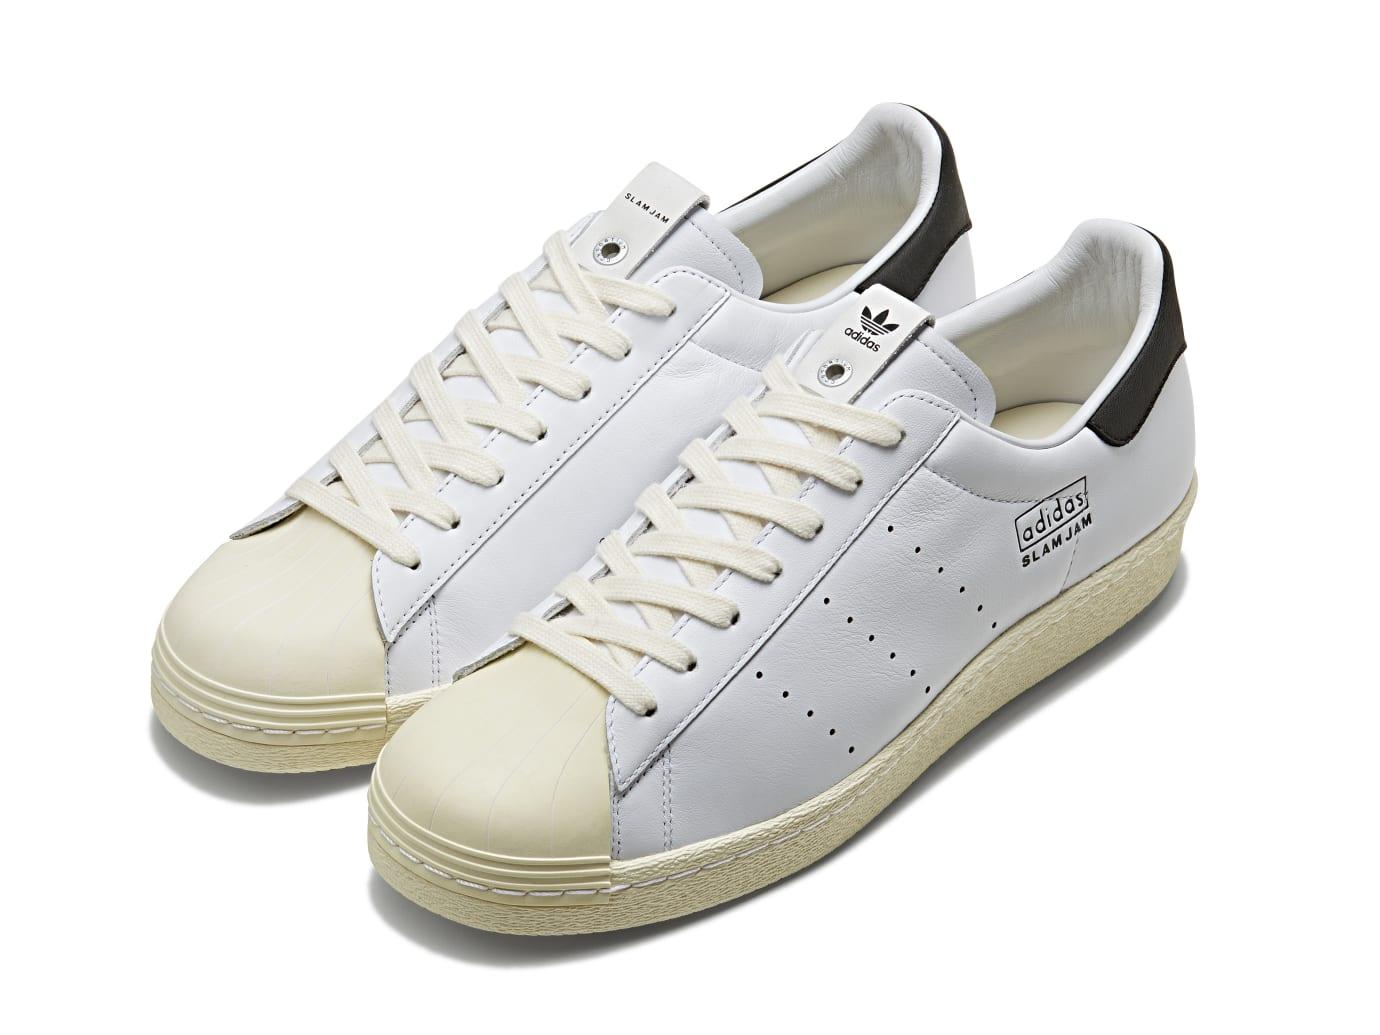 Slam Jam x Adidas 80s Superstar (Front)